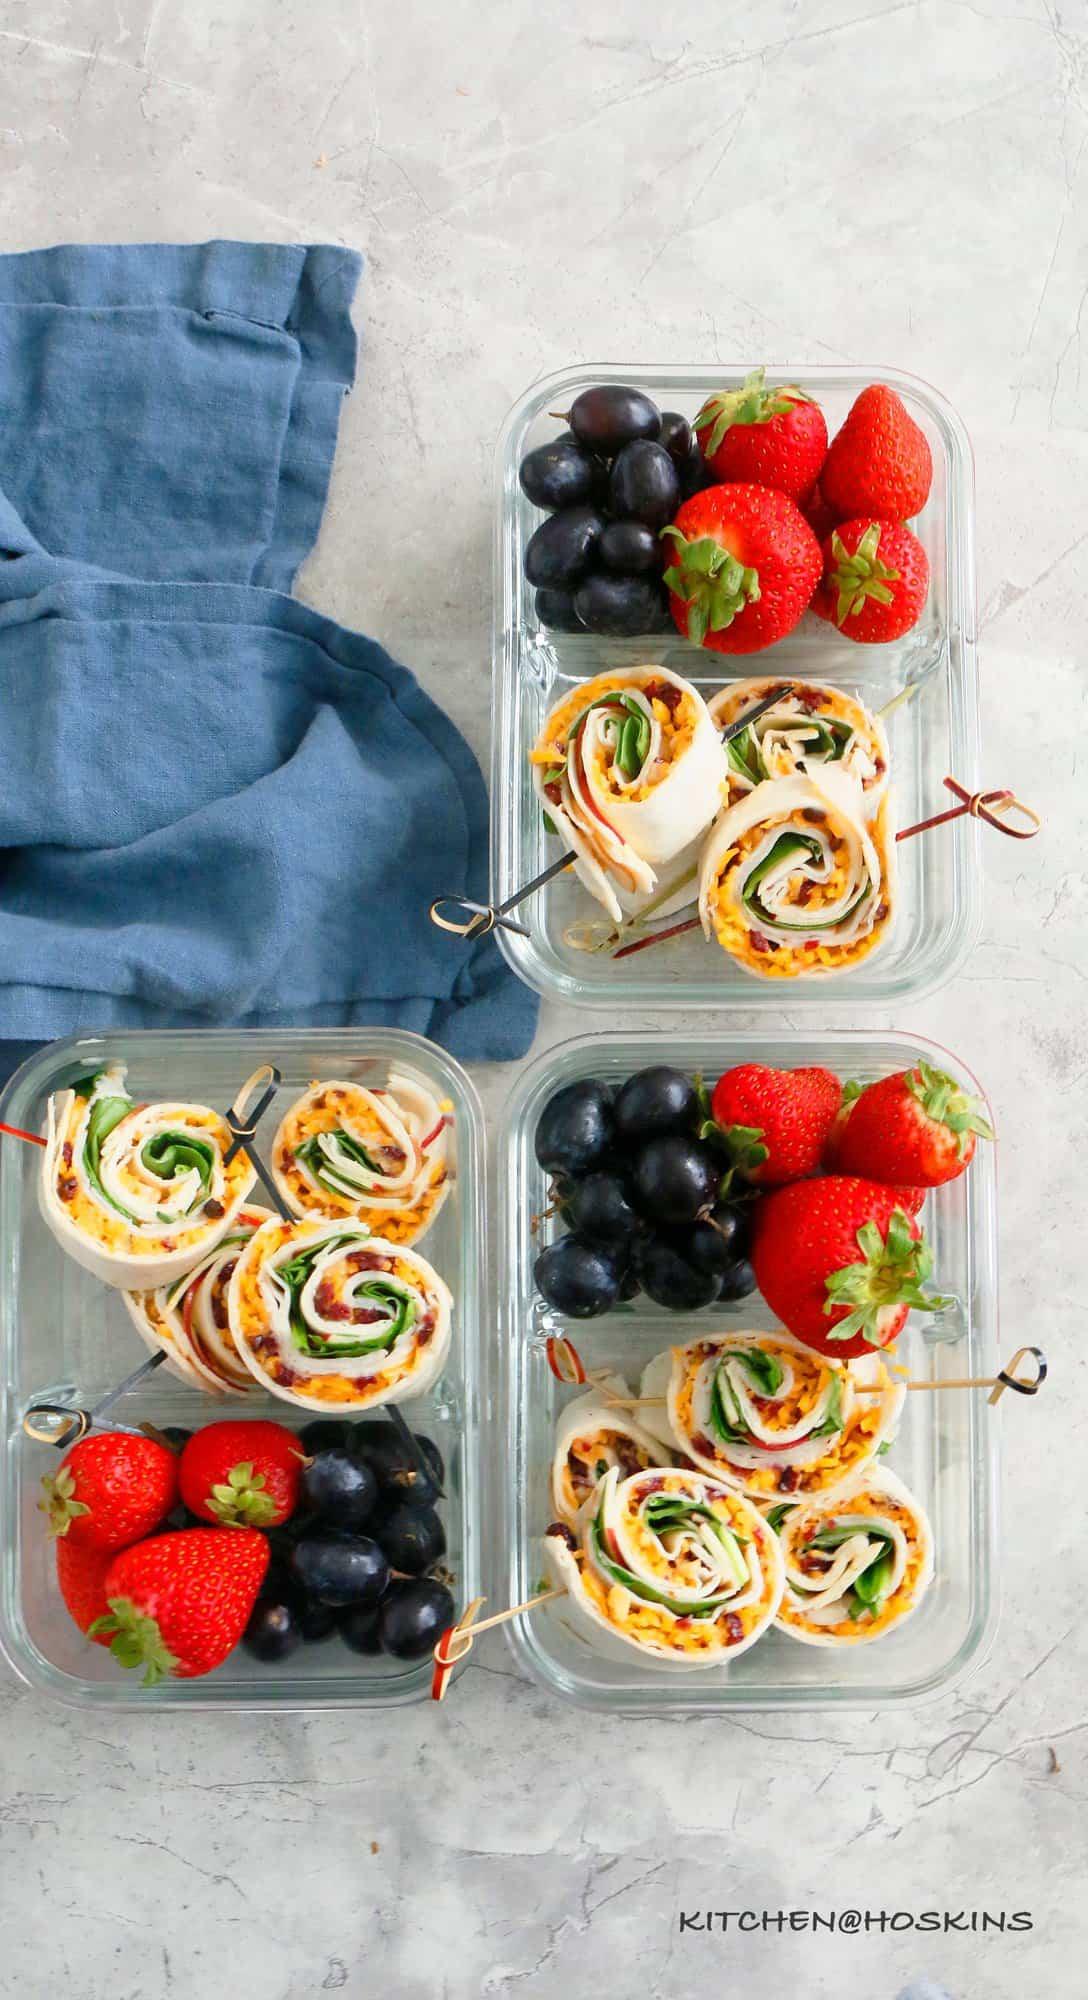 turkey apple and cheddar pinwheels in a lunch box